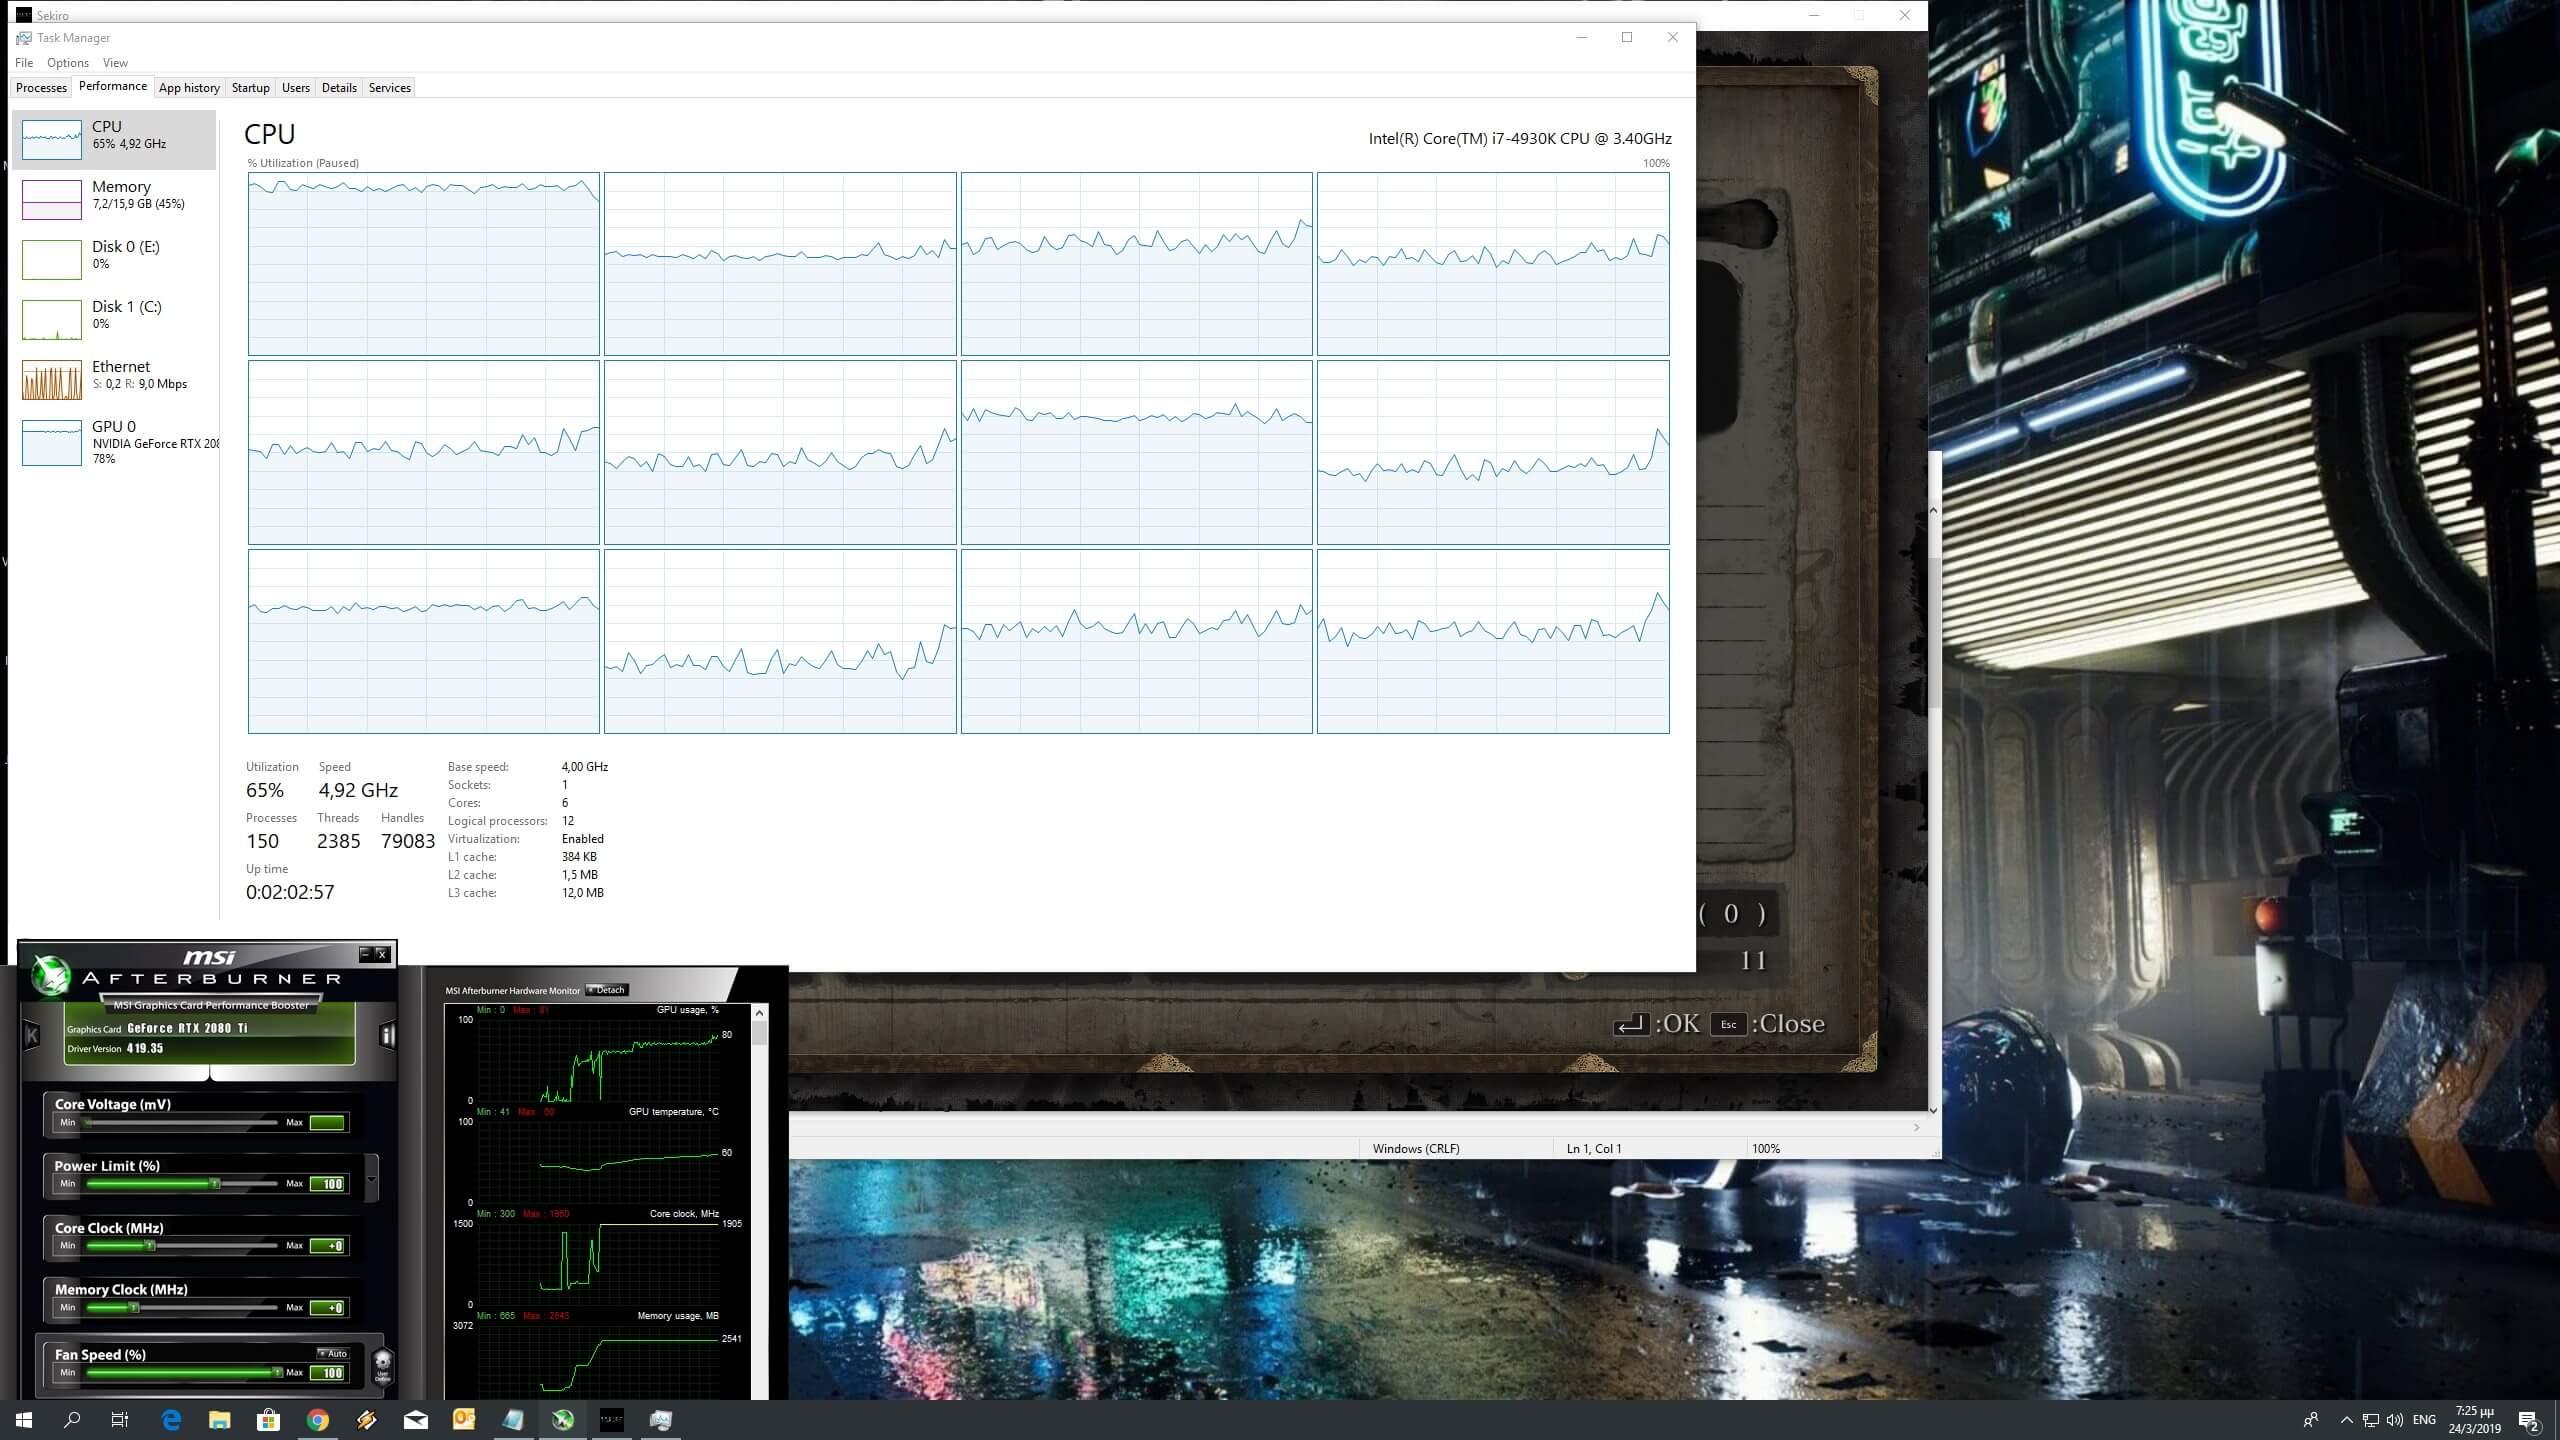 Sekiro: Shadows Die Twice PC Performance Analysis - DSOGaming